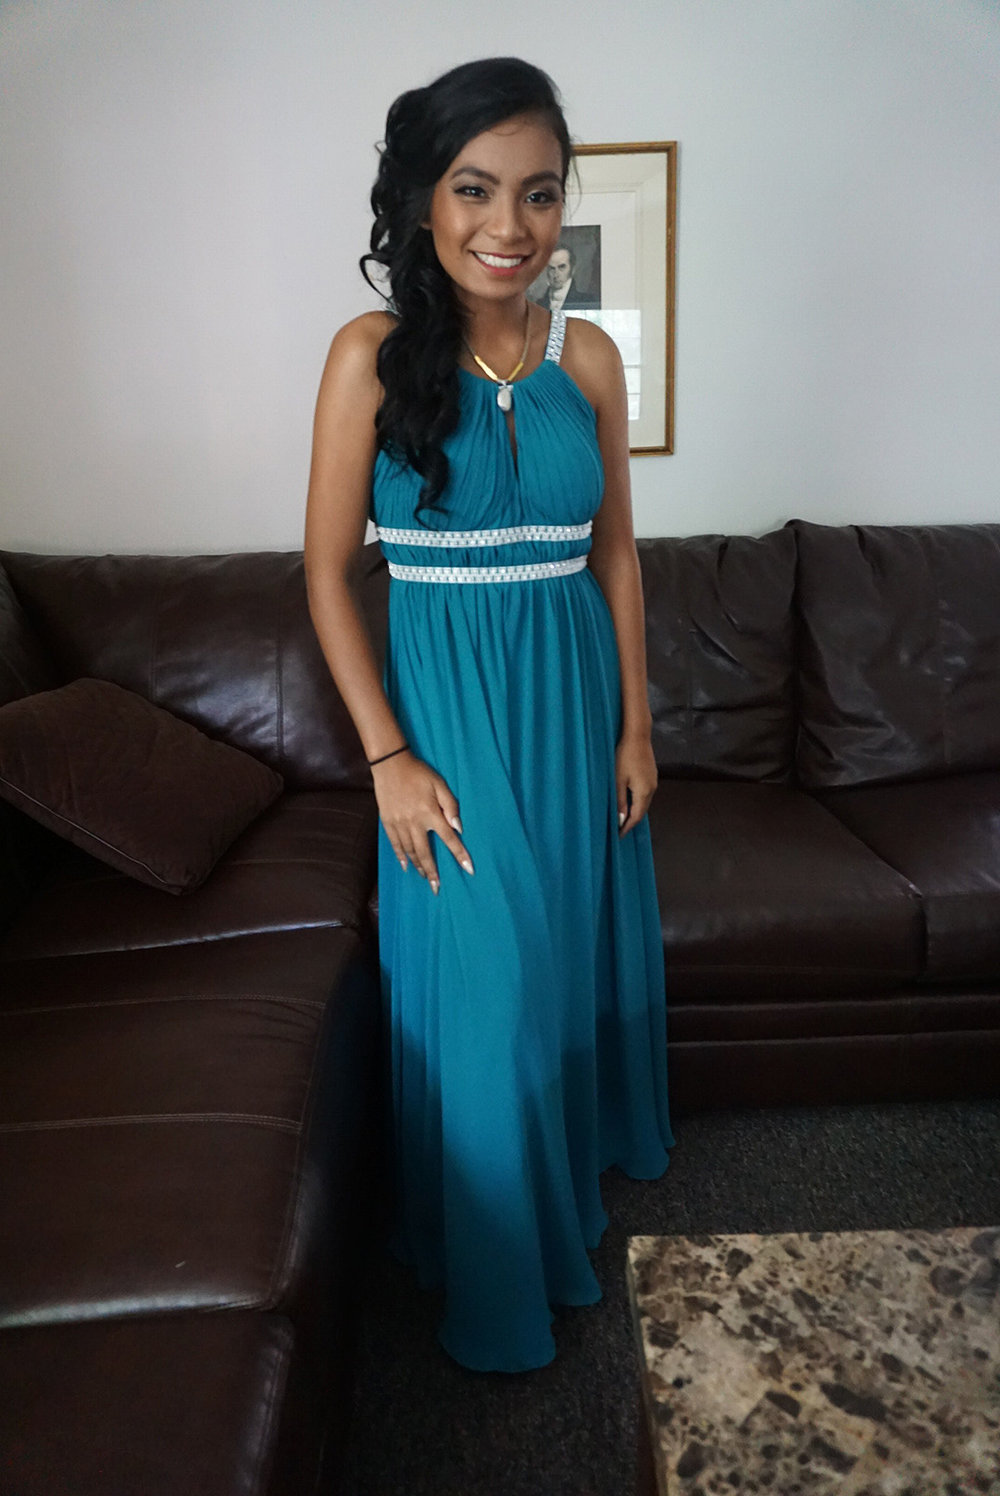 Teal-Bridesmaid-Dress-Summer-Style-Blogger-LINDATENCHITRAN-5-1616x1080.jpg